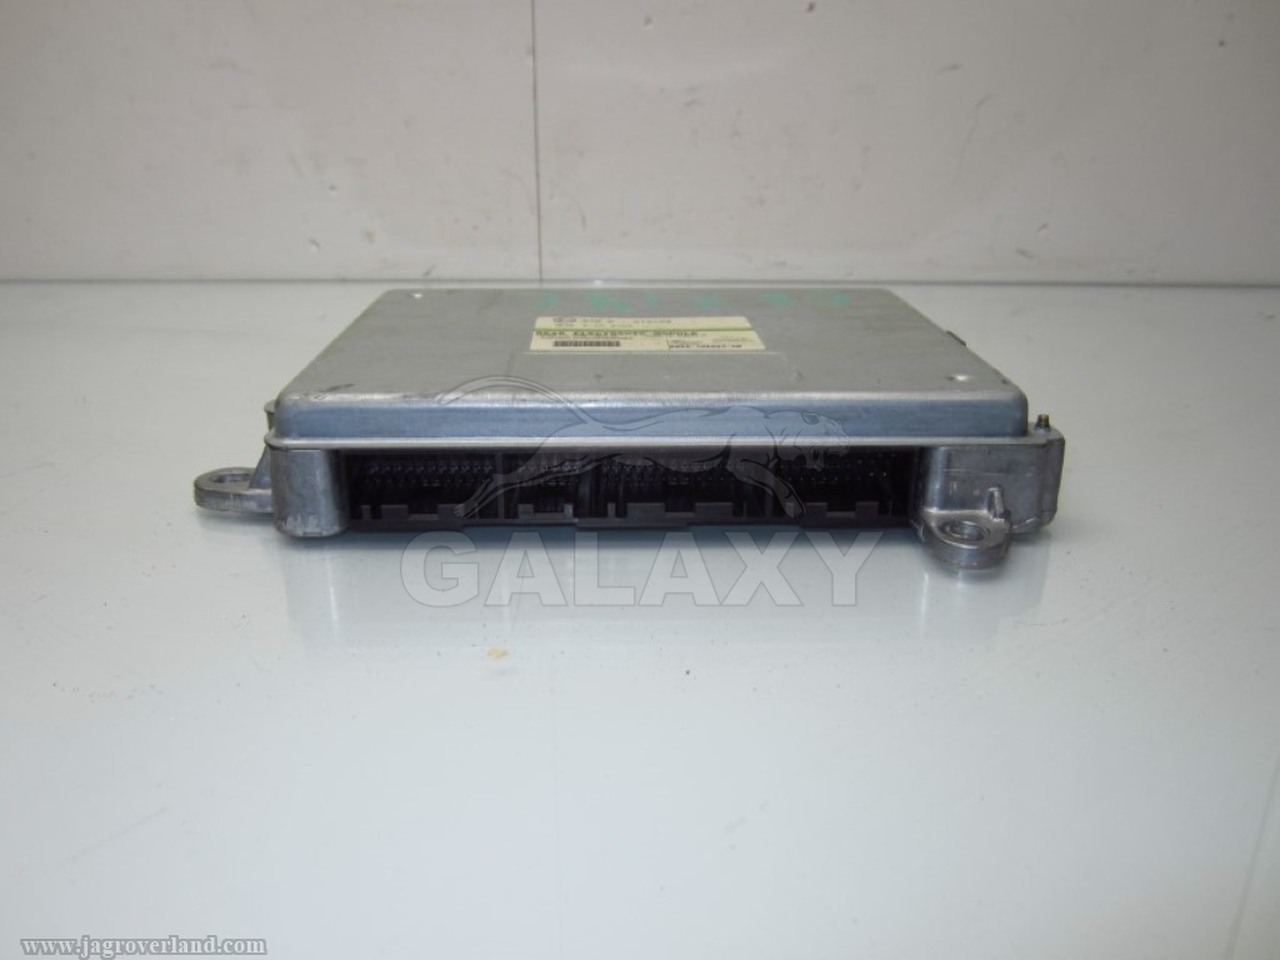 Electronic Control Module >> 06 09 Xj 8 L R Rear Electronic Control Module C2c38663 5w93 13b524 Ab